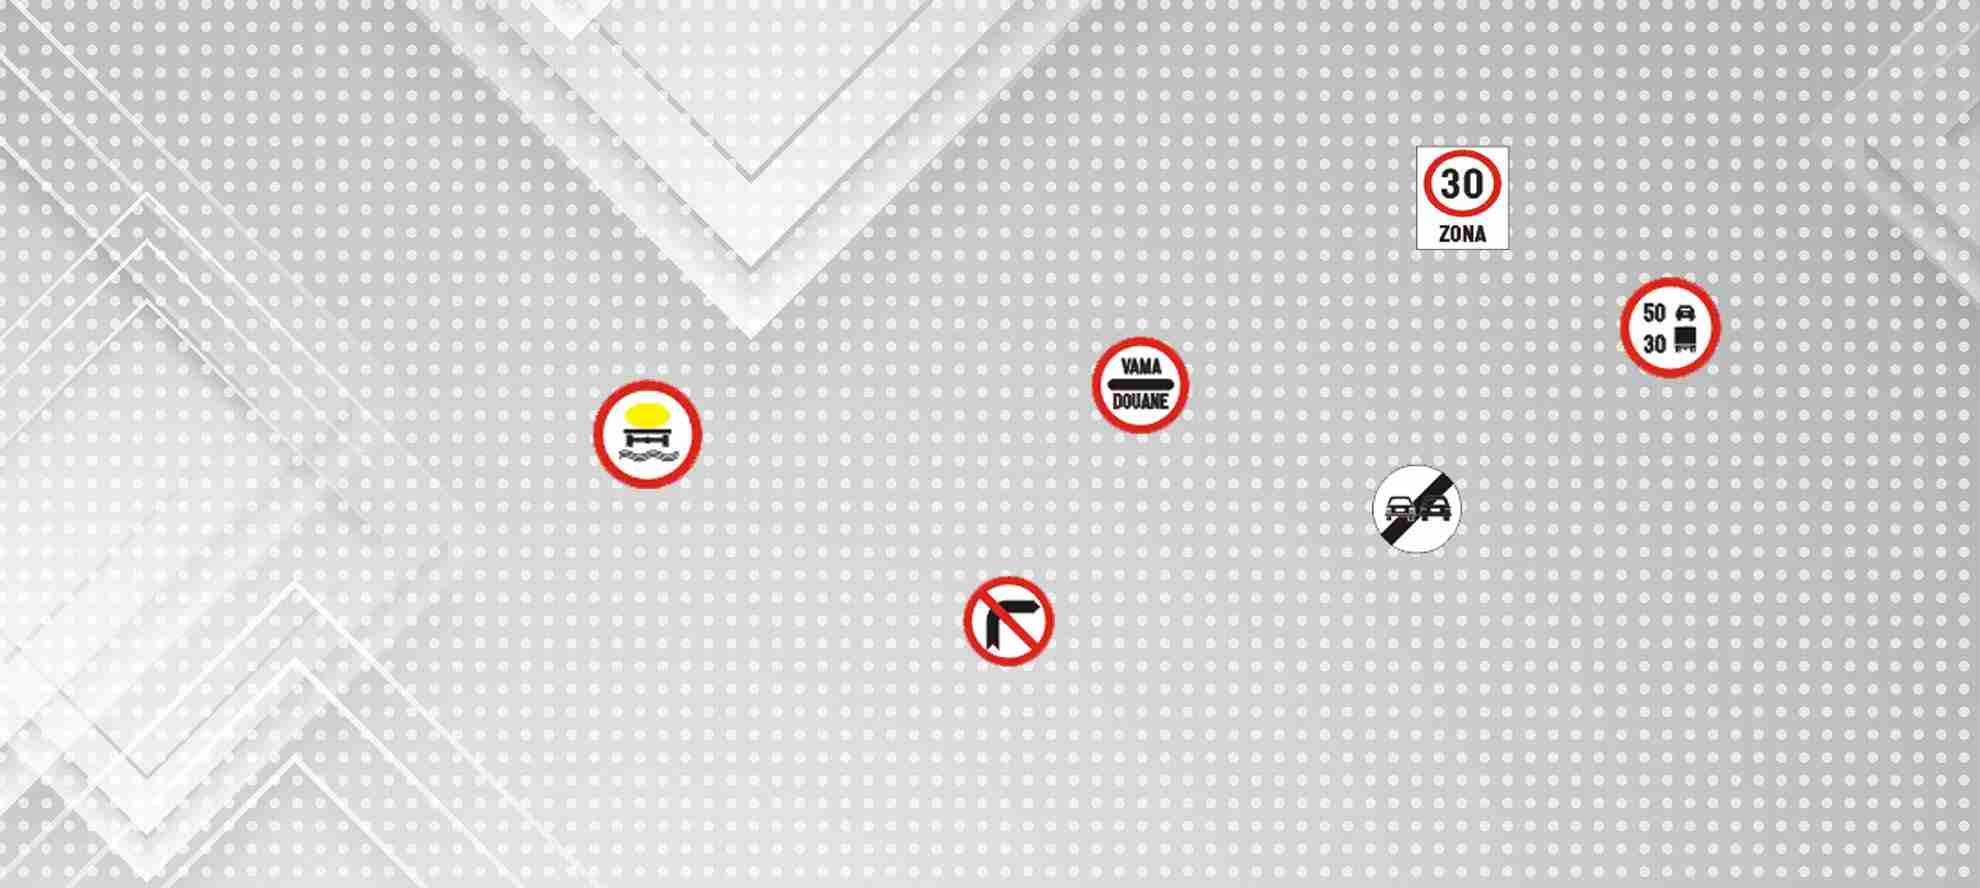 scoala-de-soferi-brasov-sds-automobile-blog-indicatoare-i